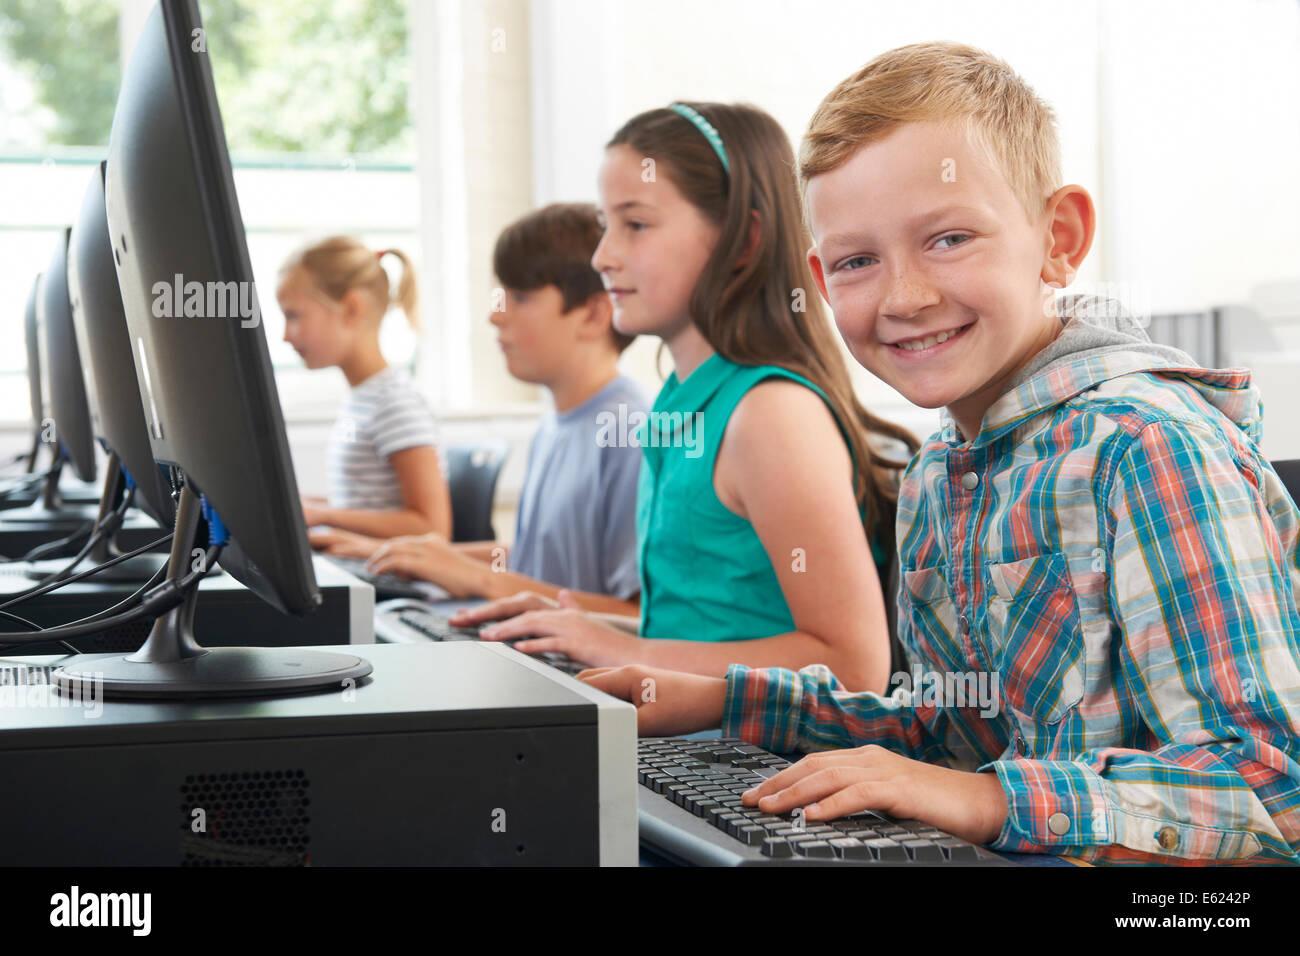 Group Of Elementary School Children In Computer Class - Stock Image